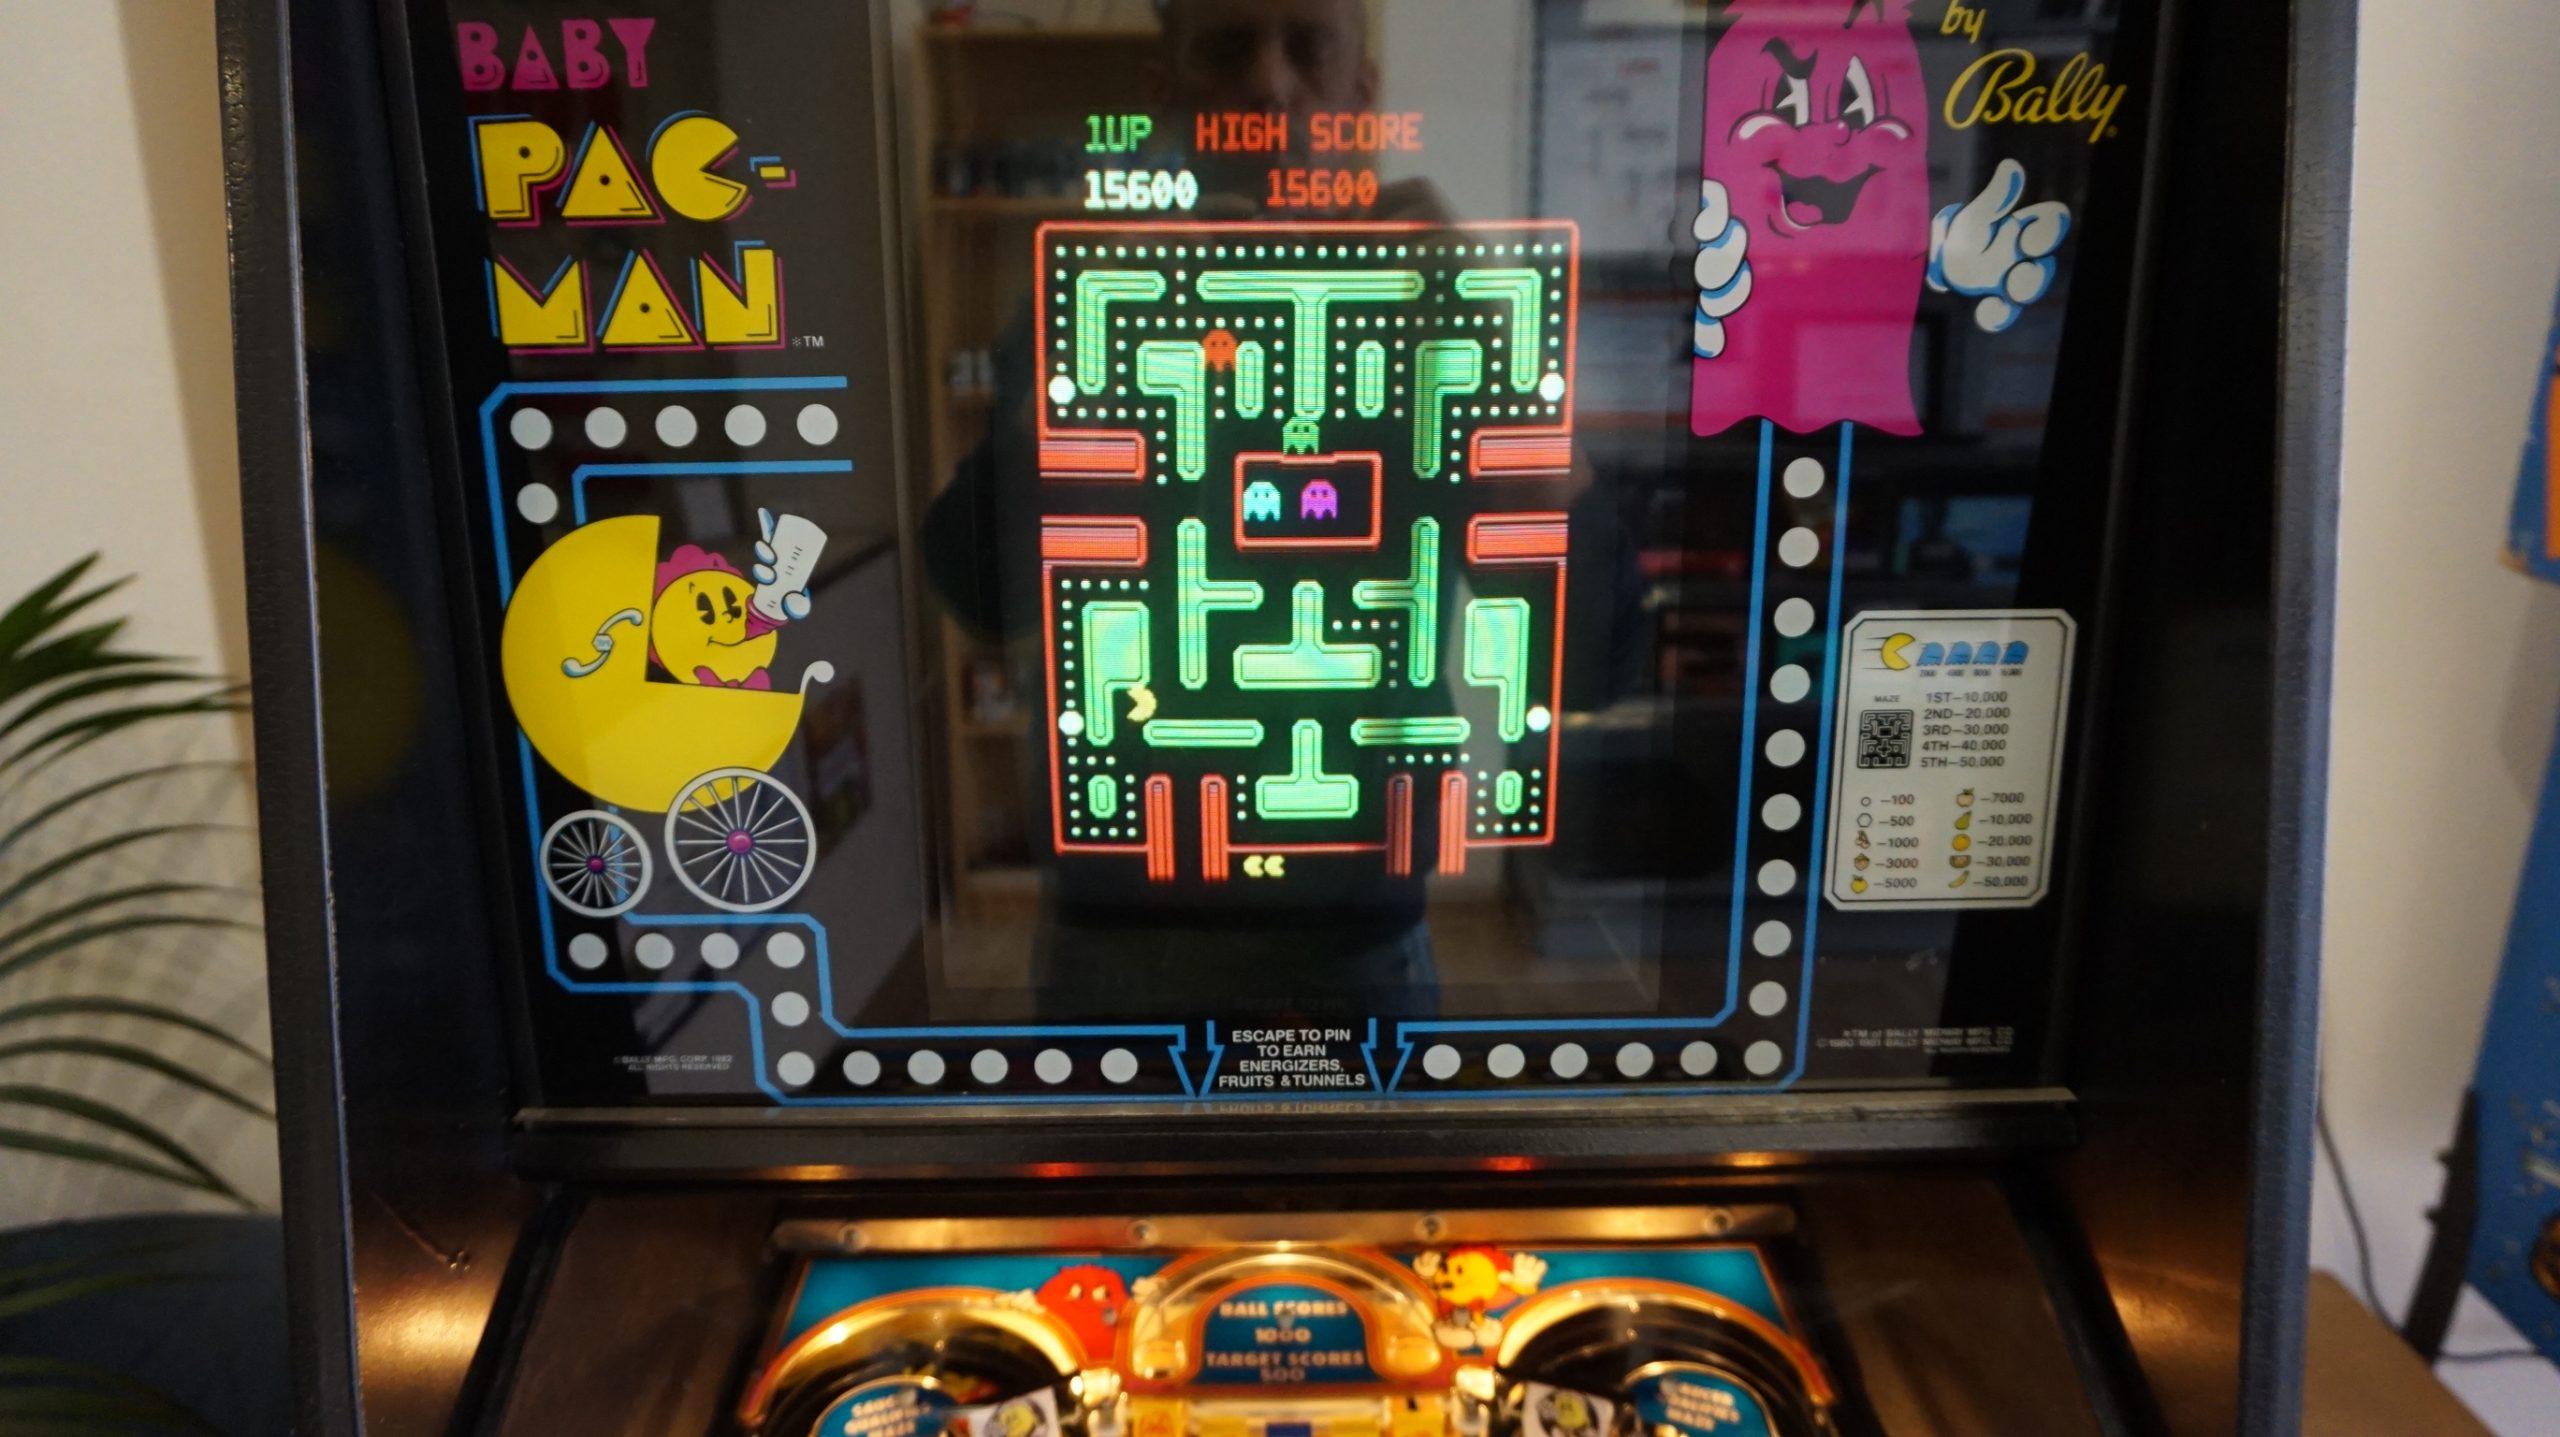 Baby Pac-Man | Bally | Video Game